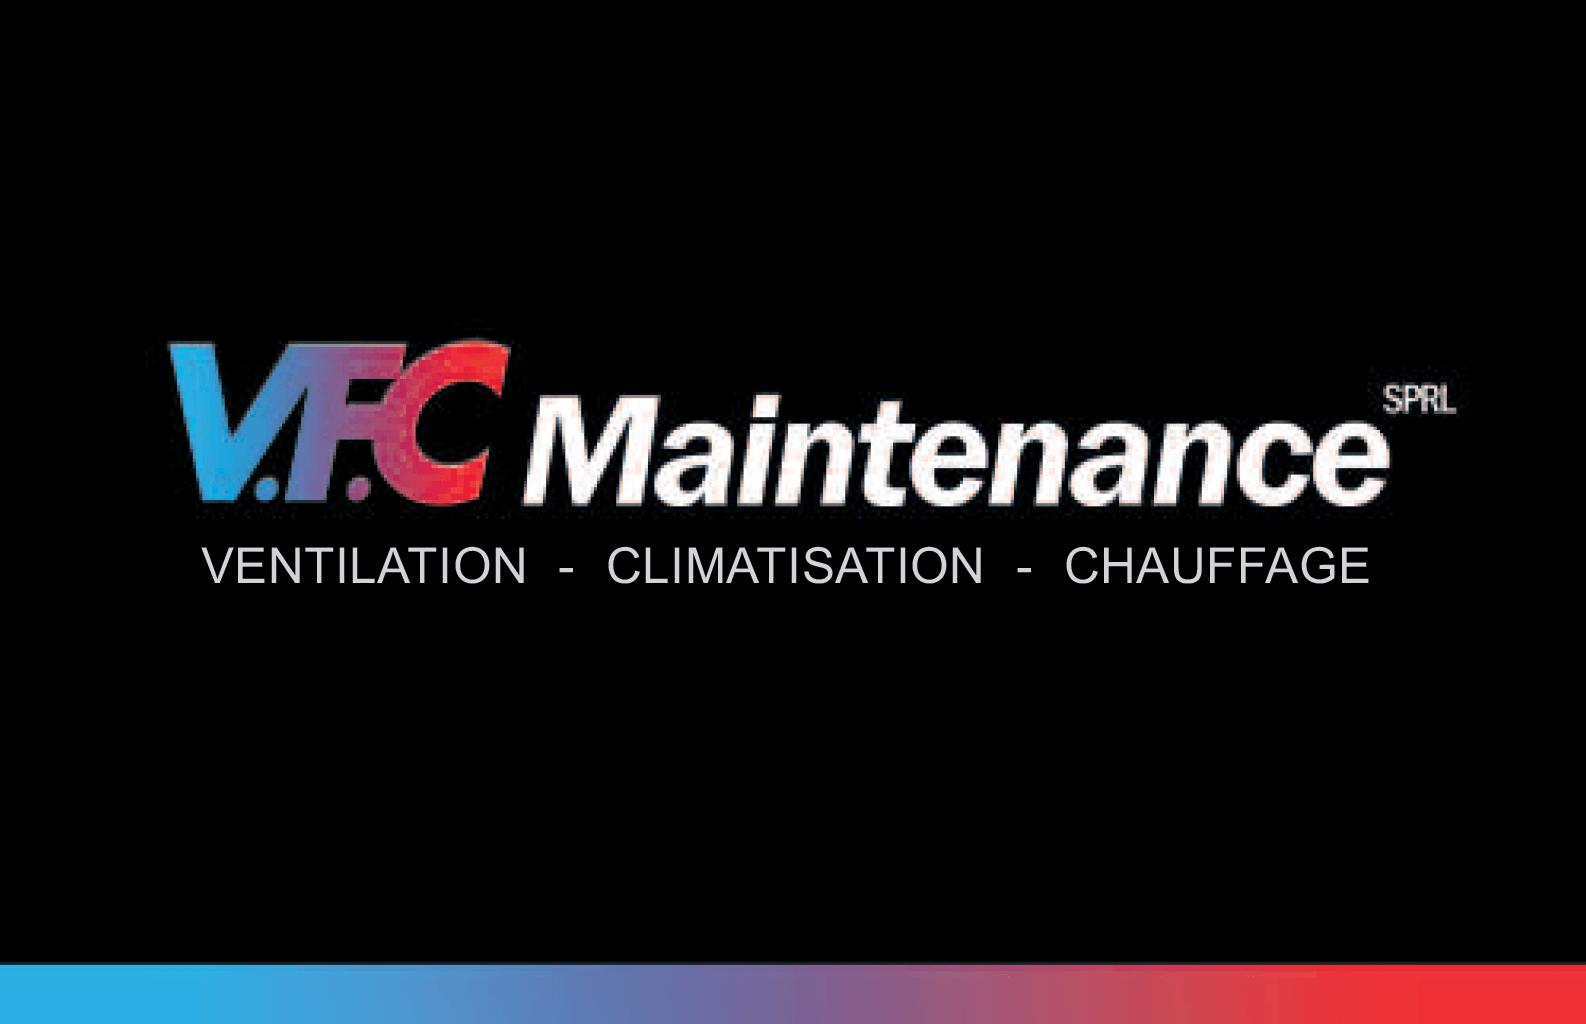 V.F.C Maintenance